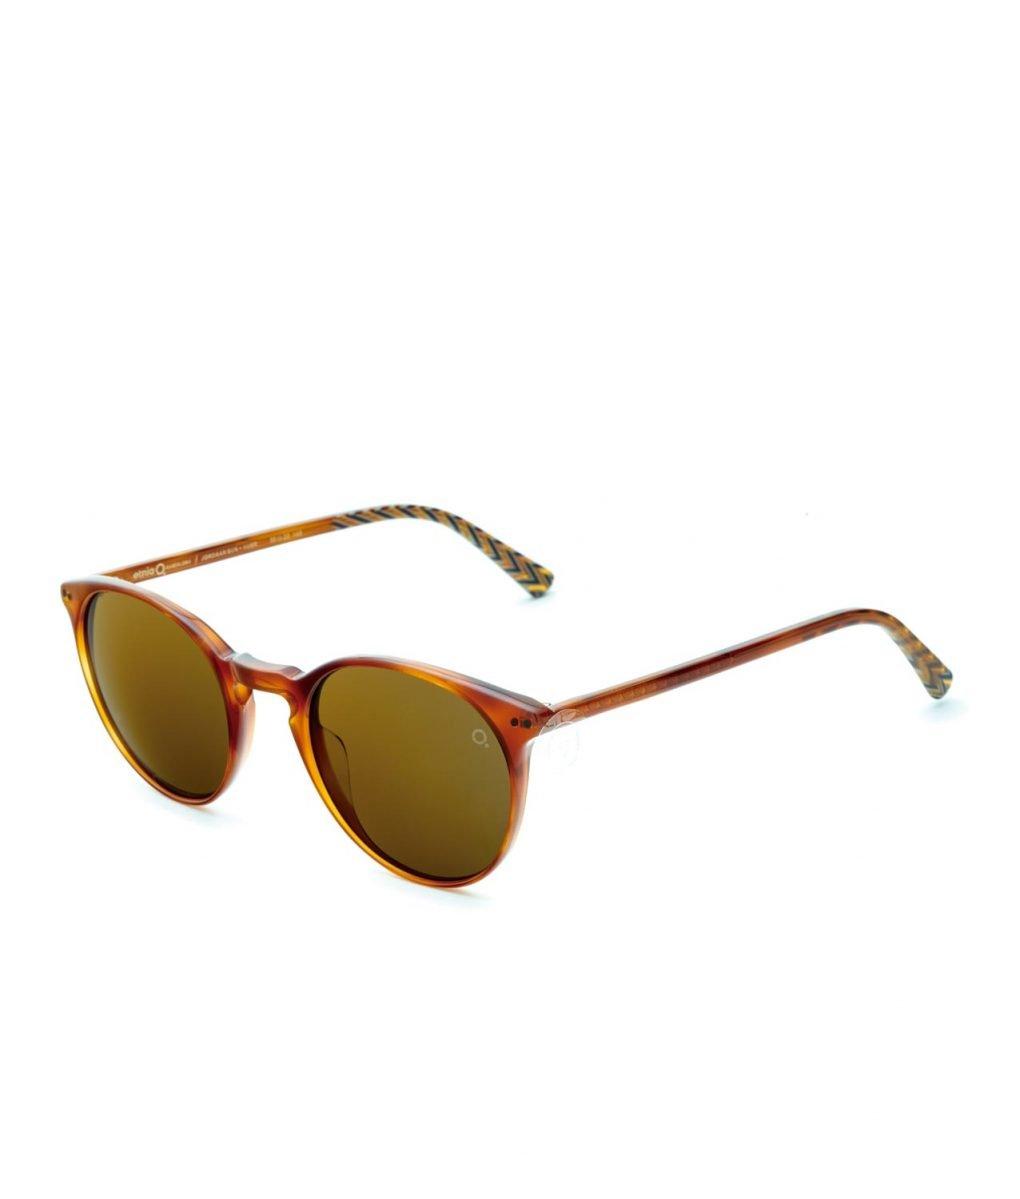 sunglasses etnia barcelona